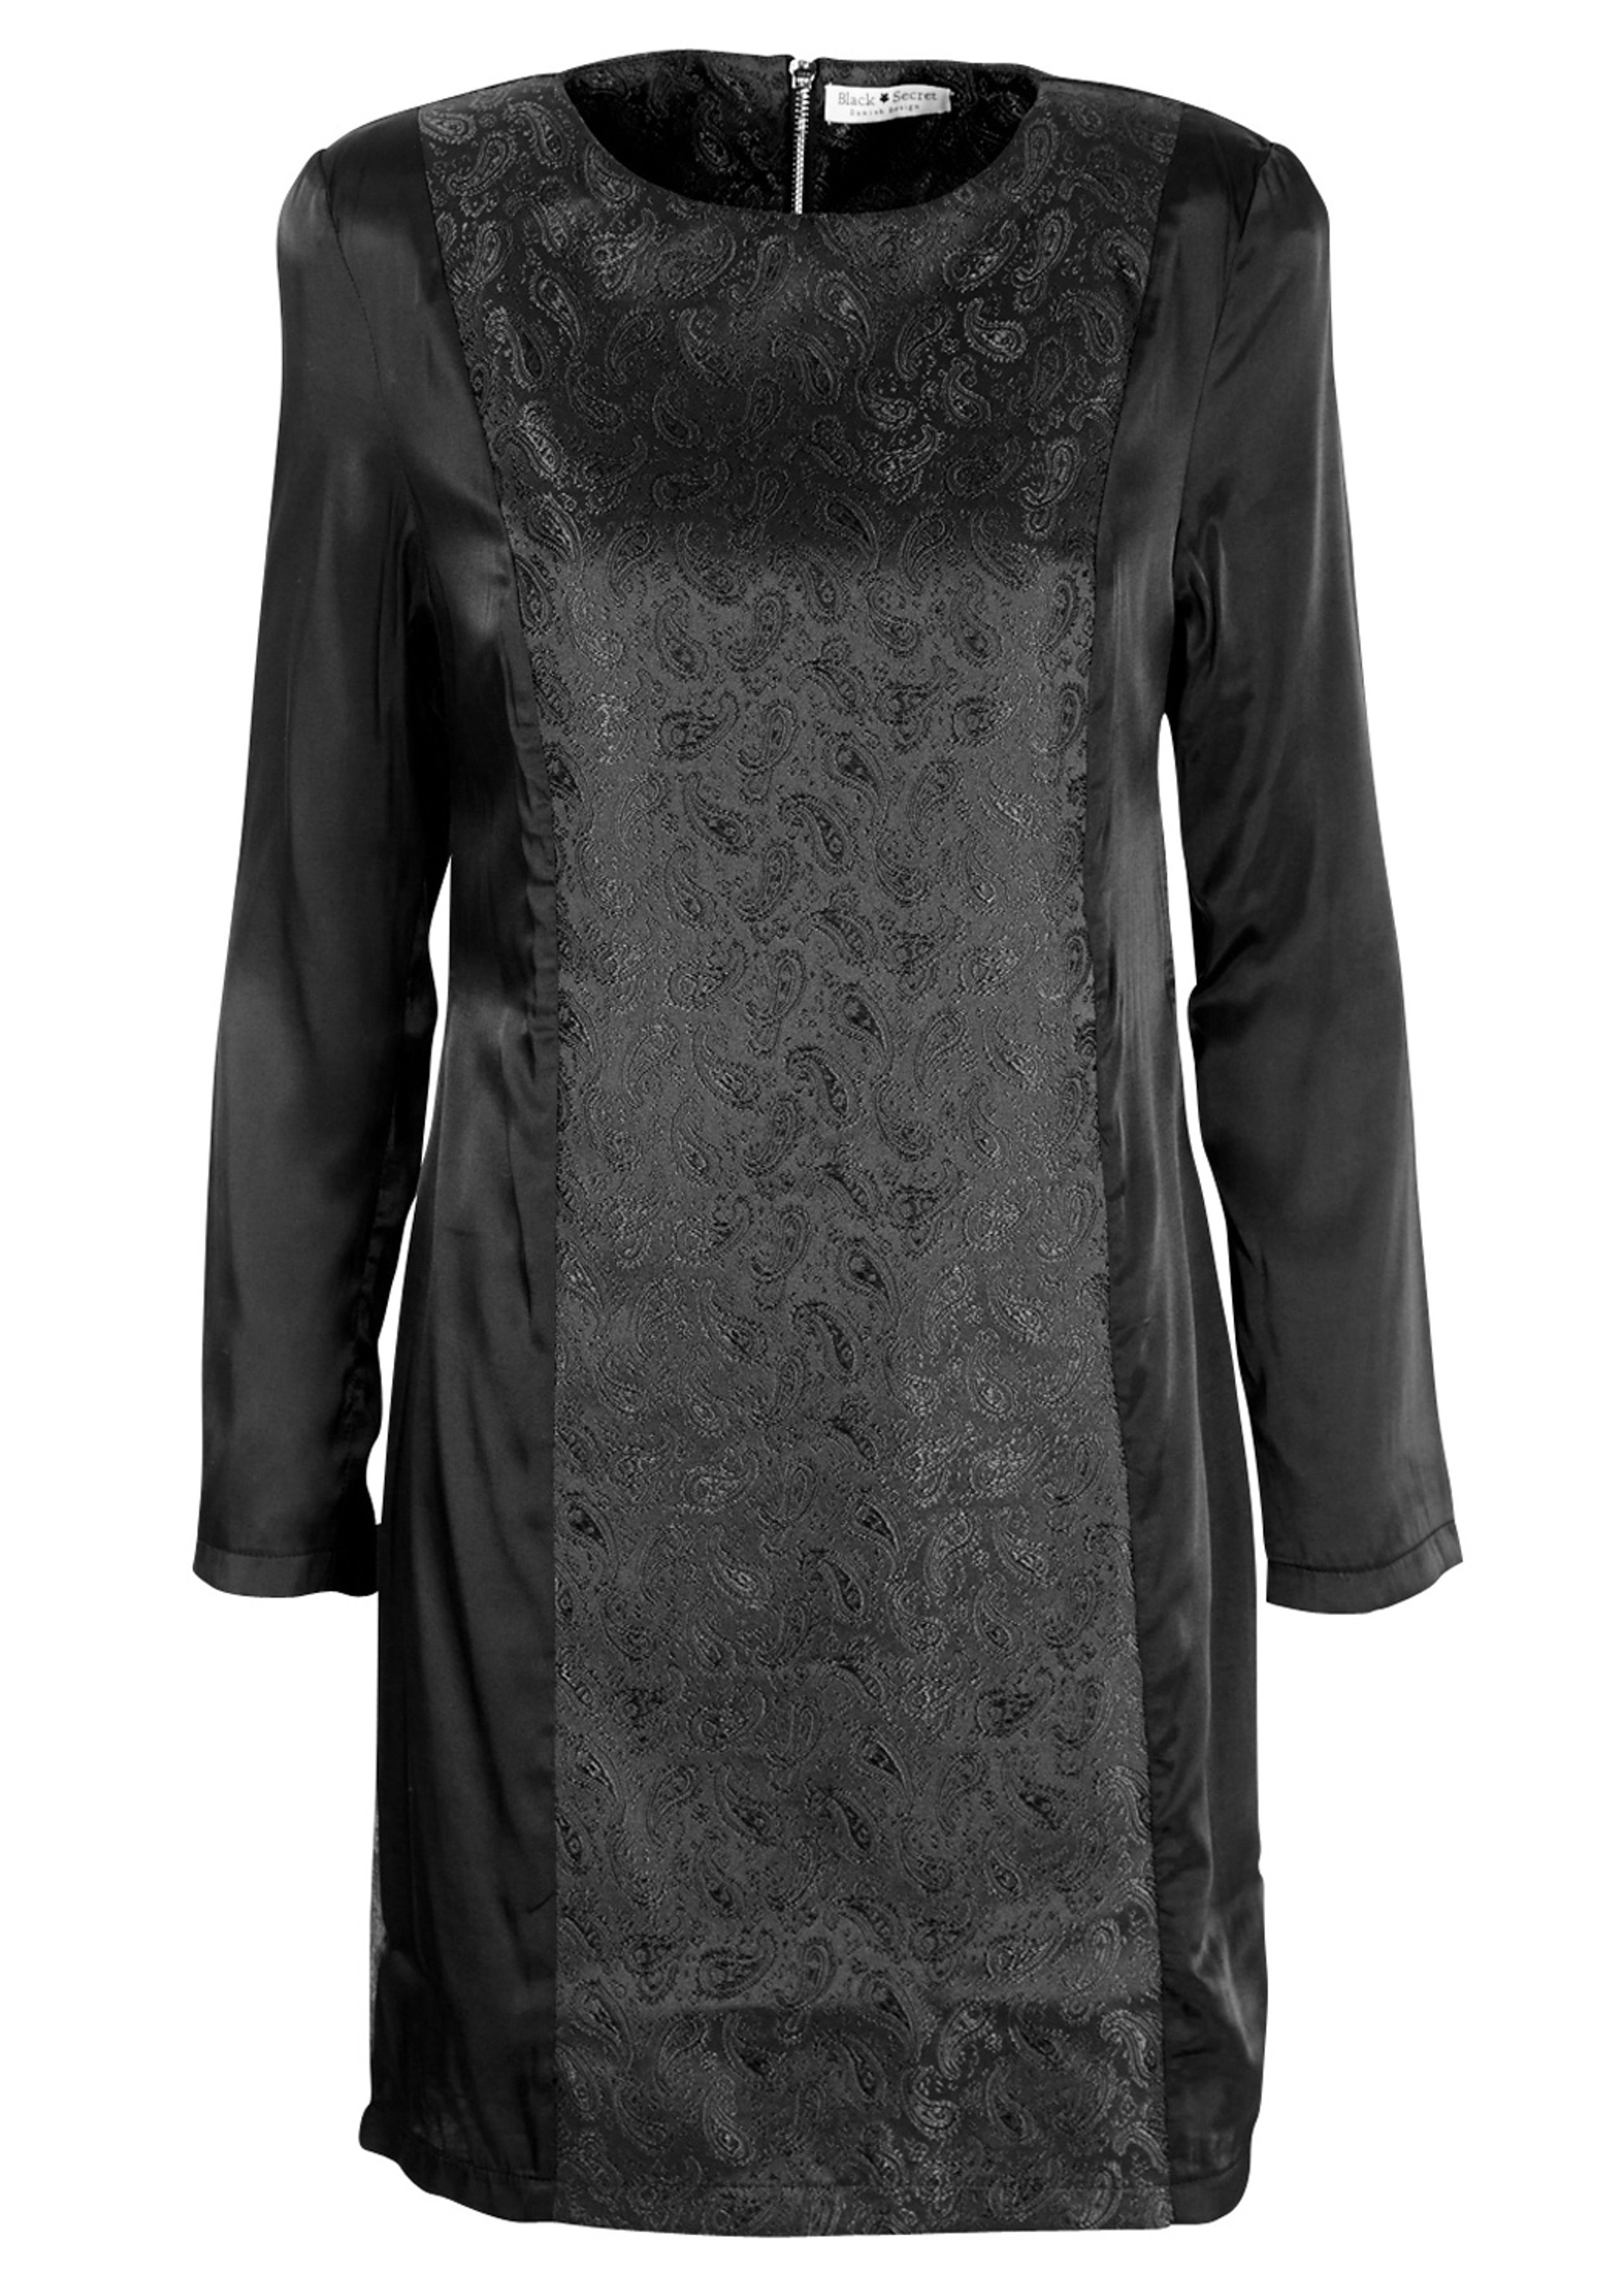 Hymus dress